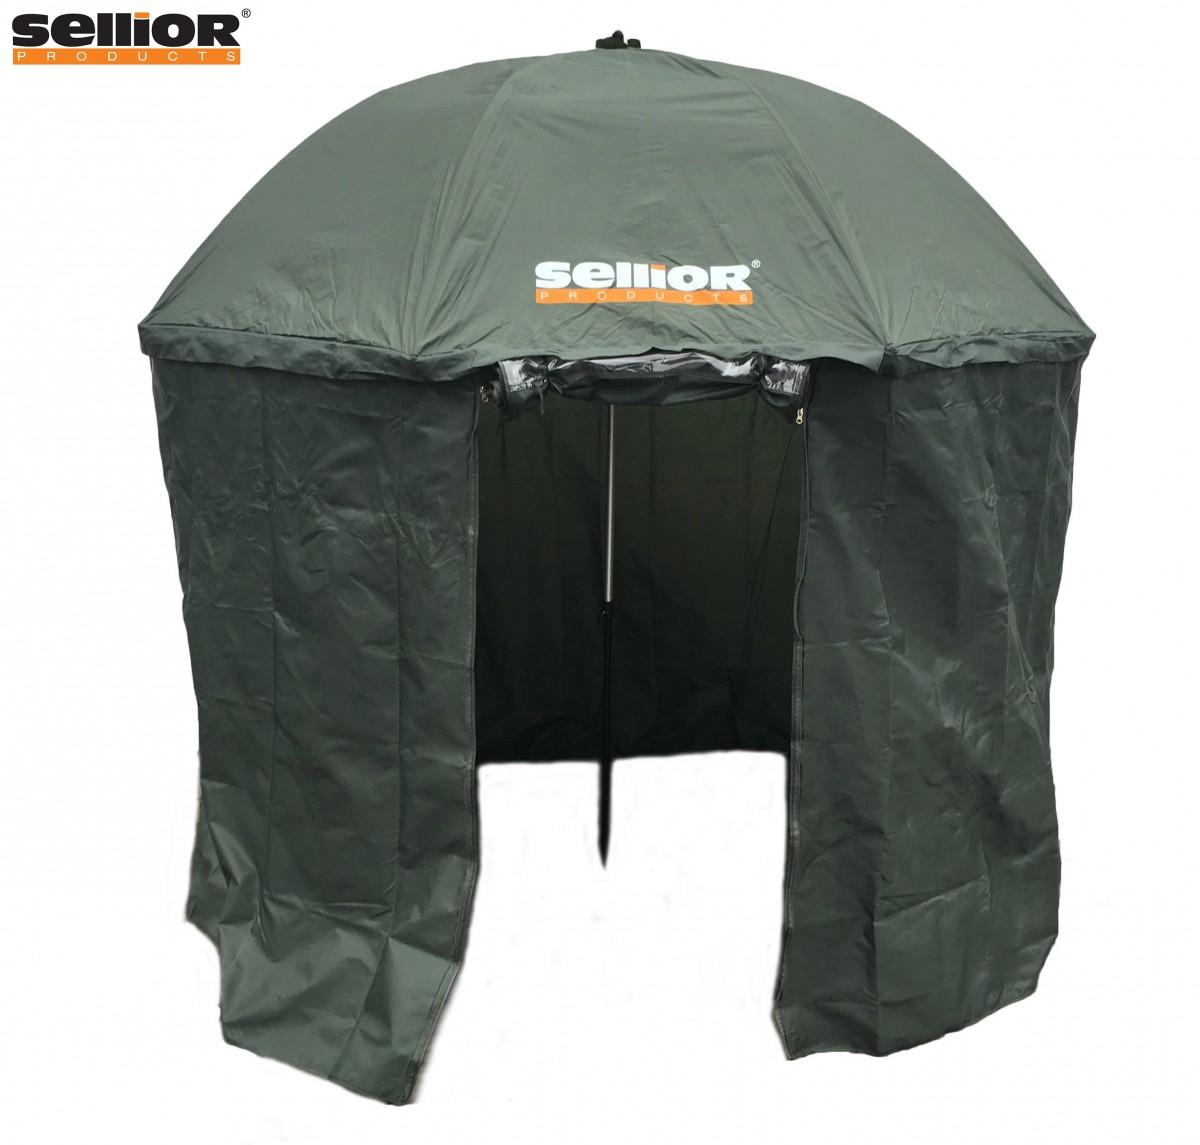 deštník s bočnicí Sellior Element Full Cover 250